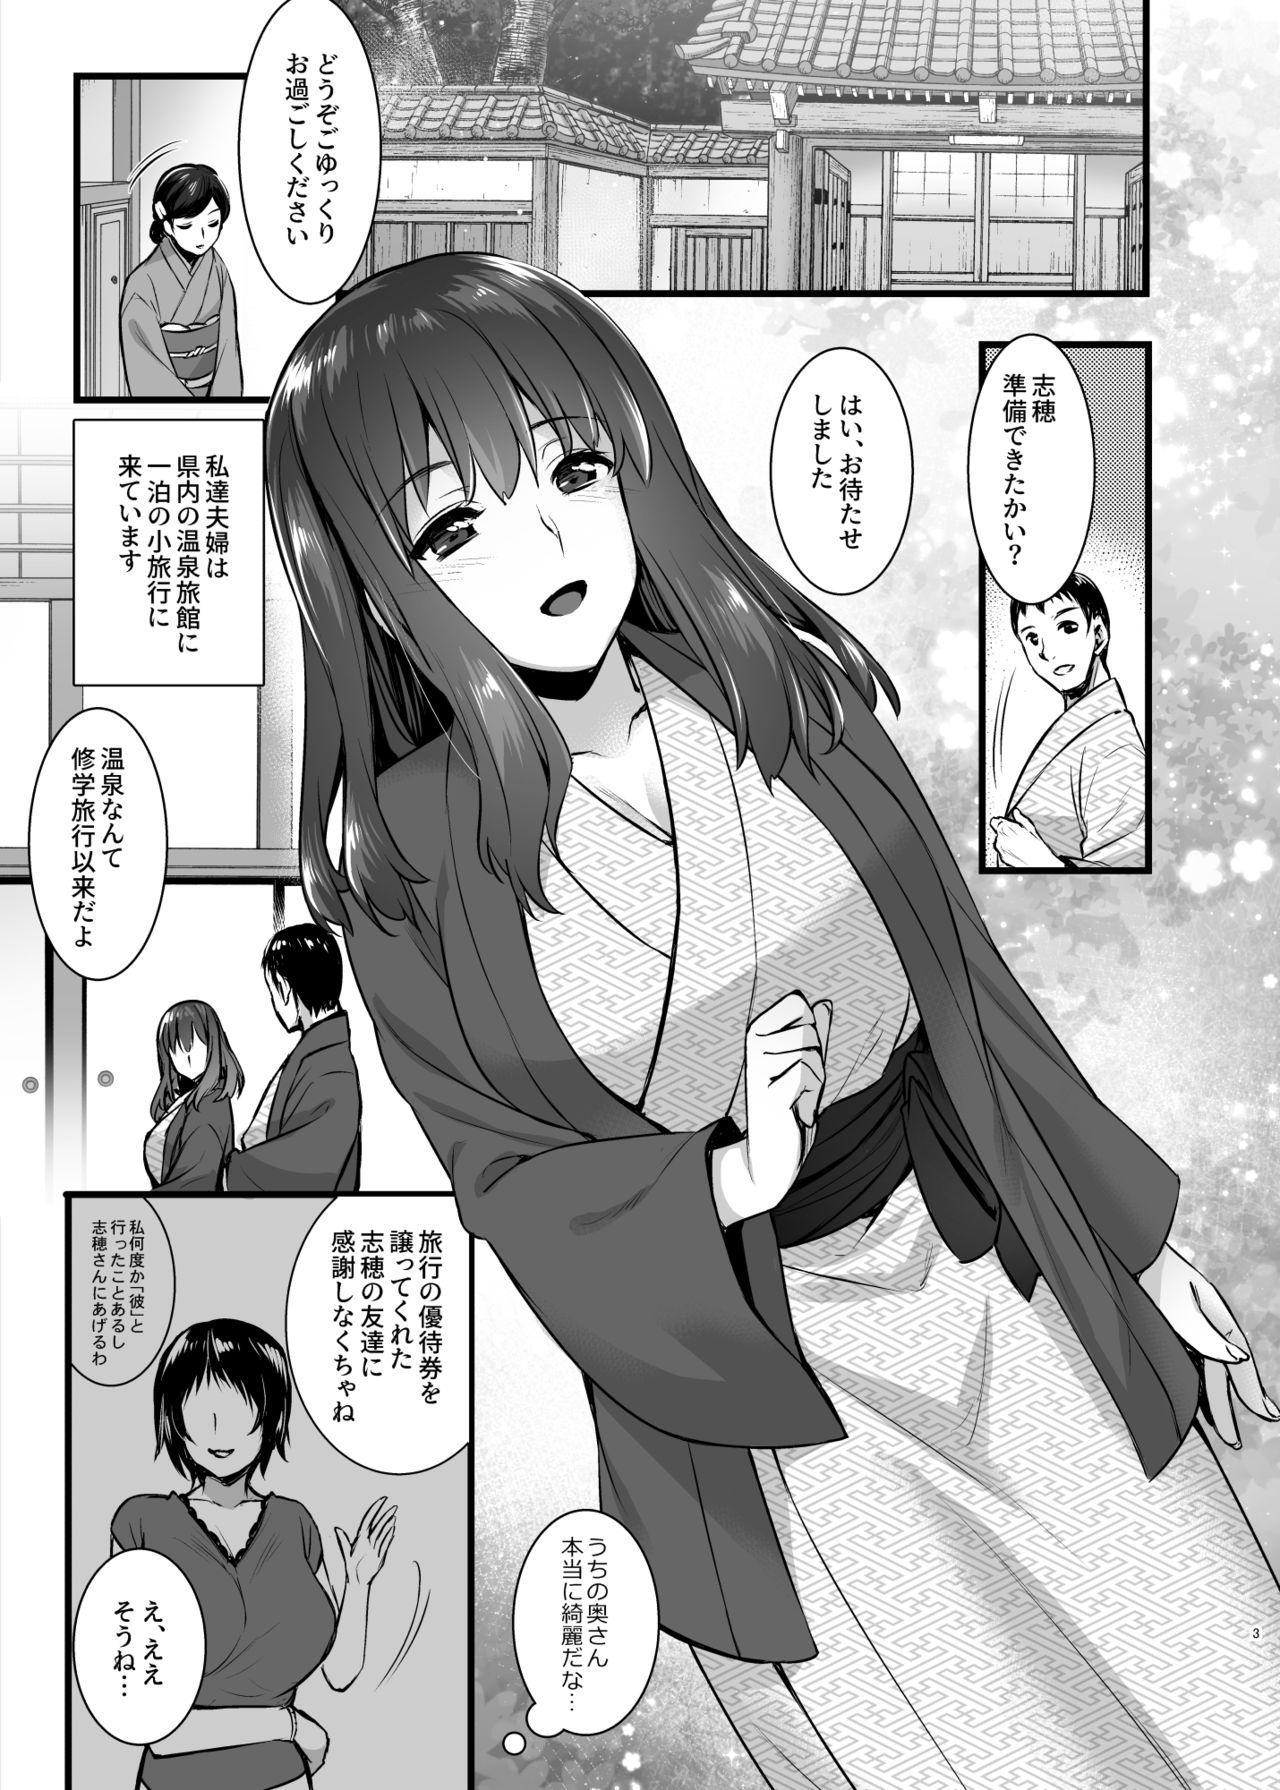 Rental Tanetsuke Oji-san 2 After 1